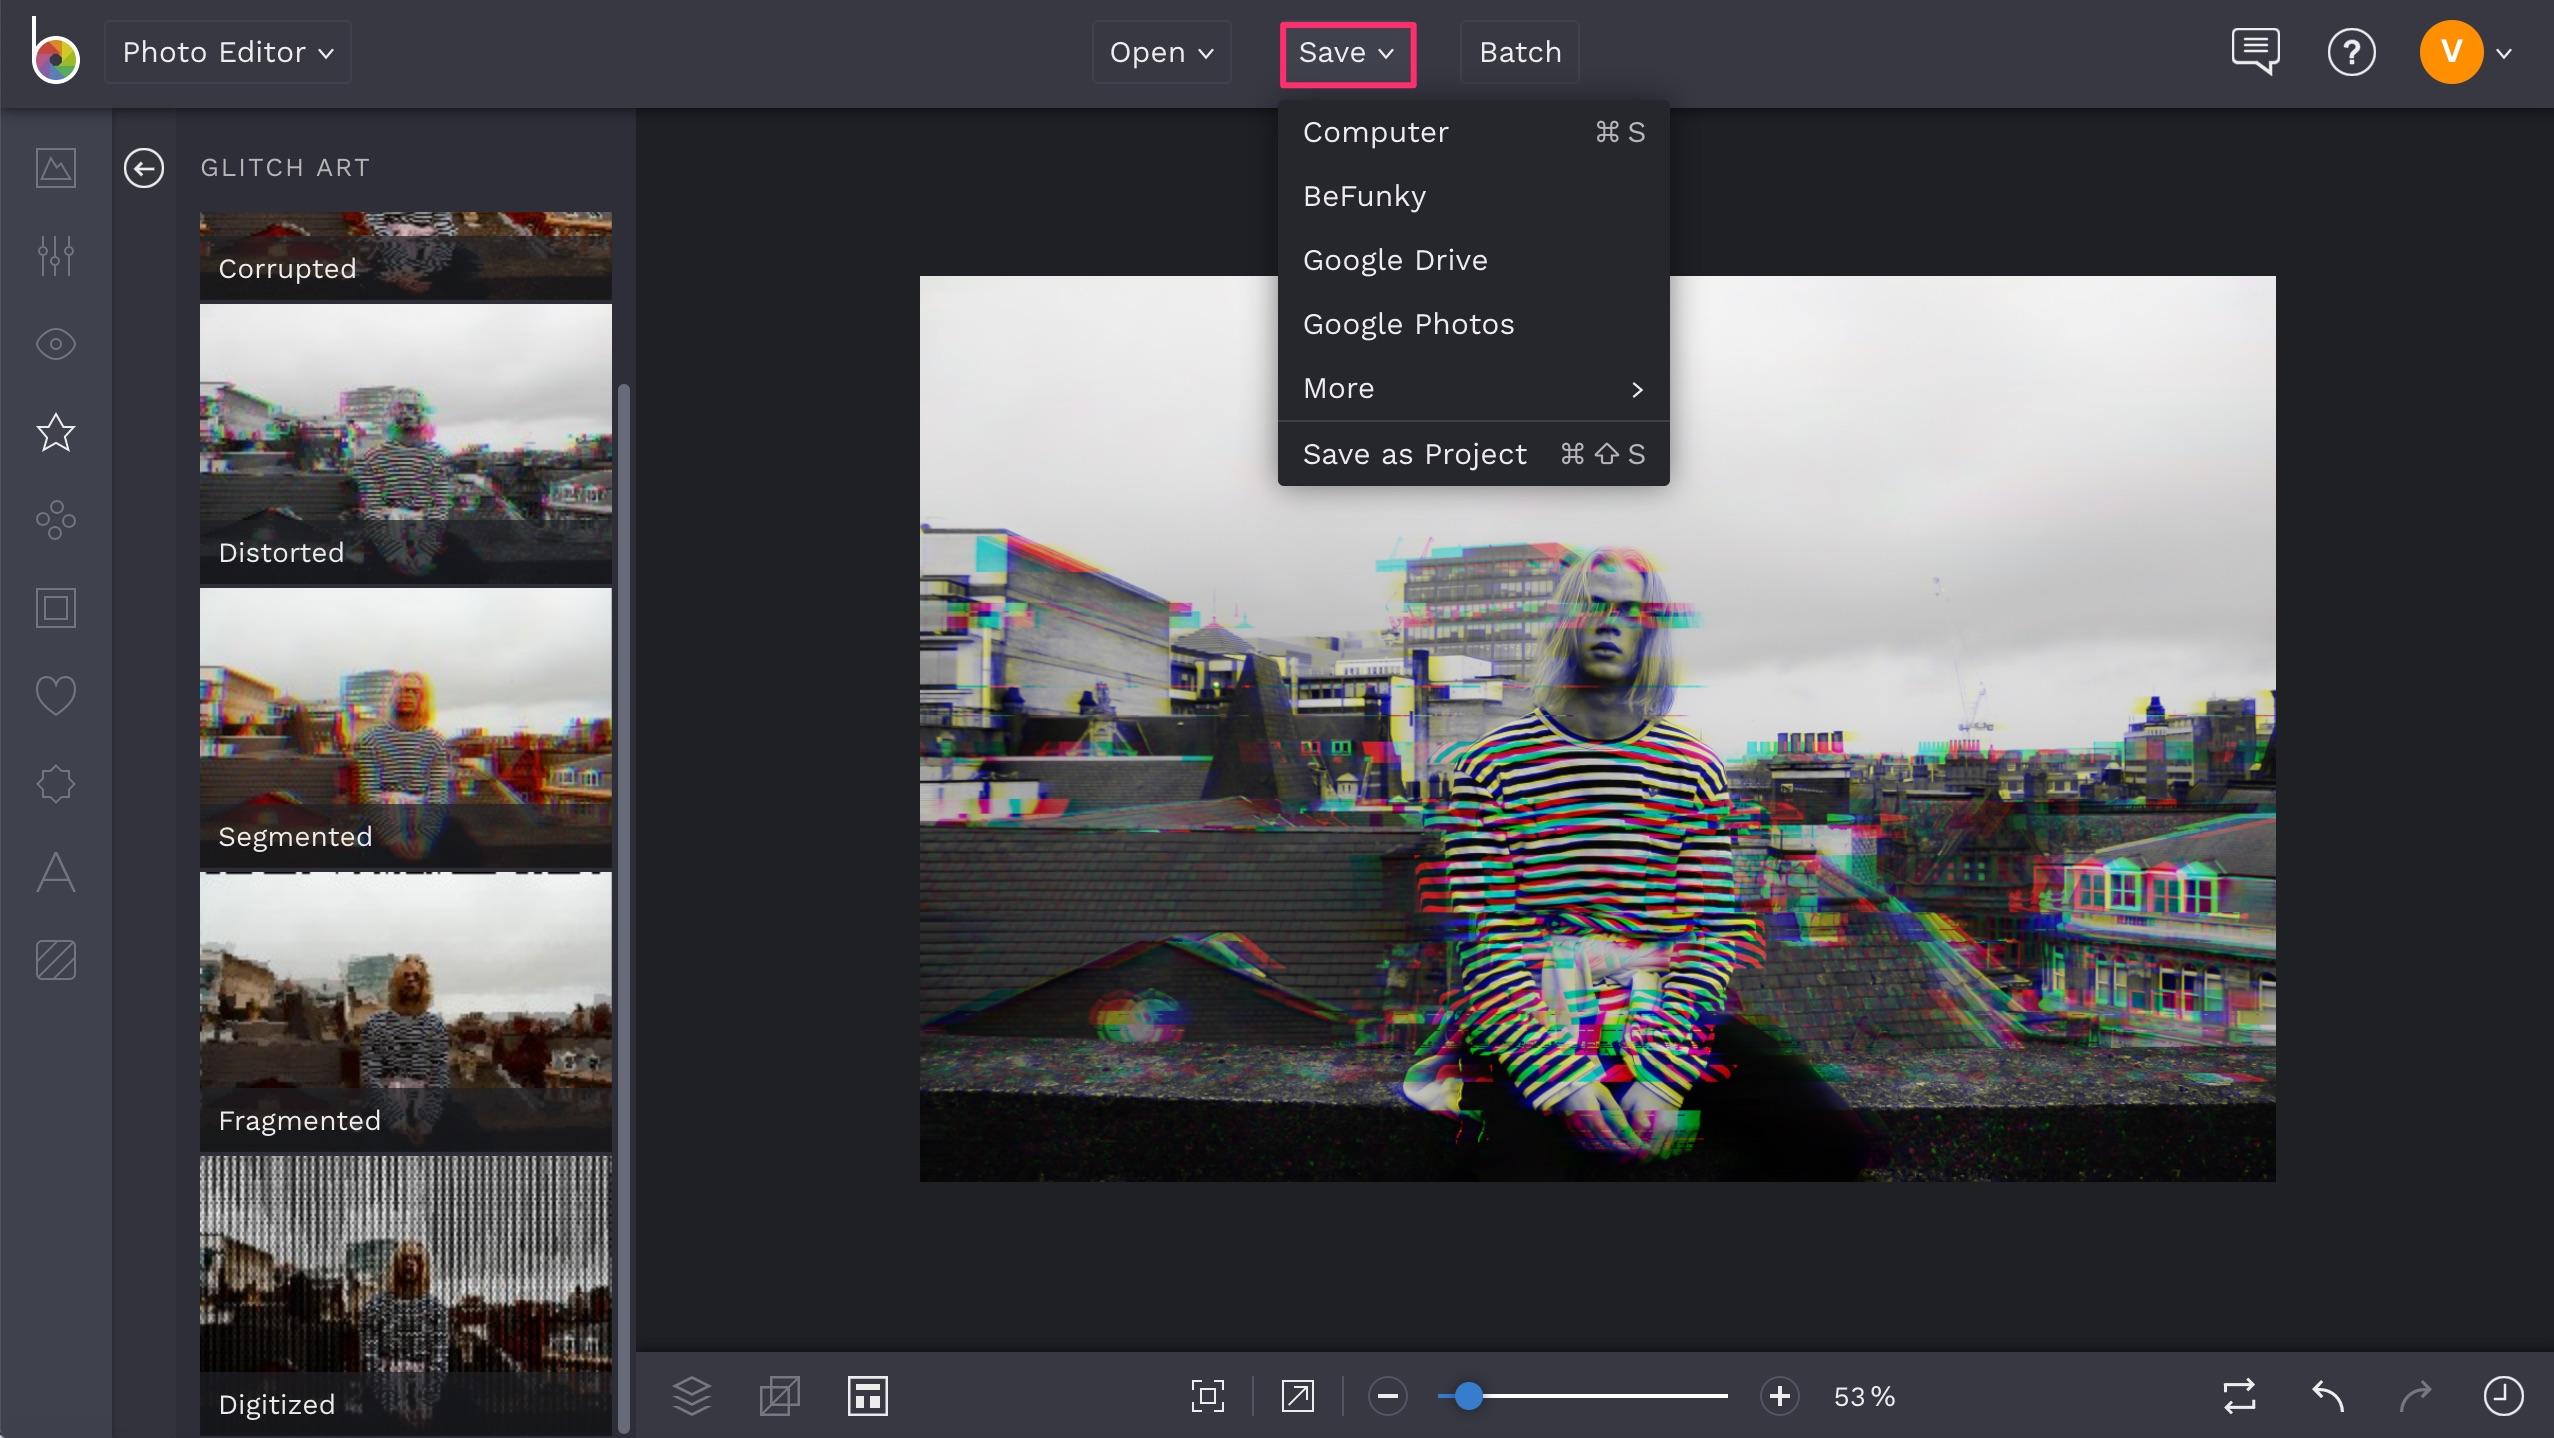 BeFunky glitch art effect save photo